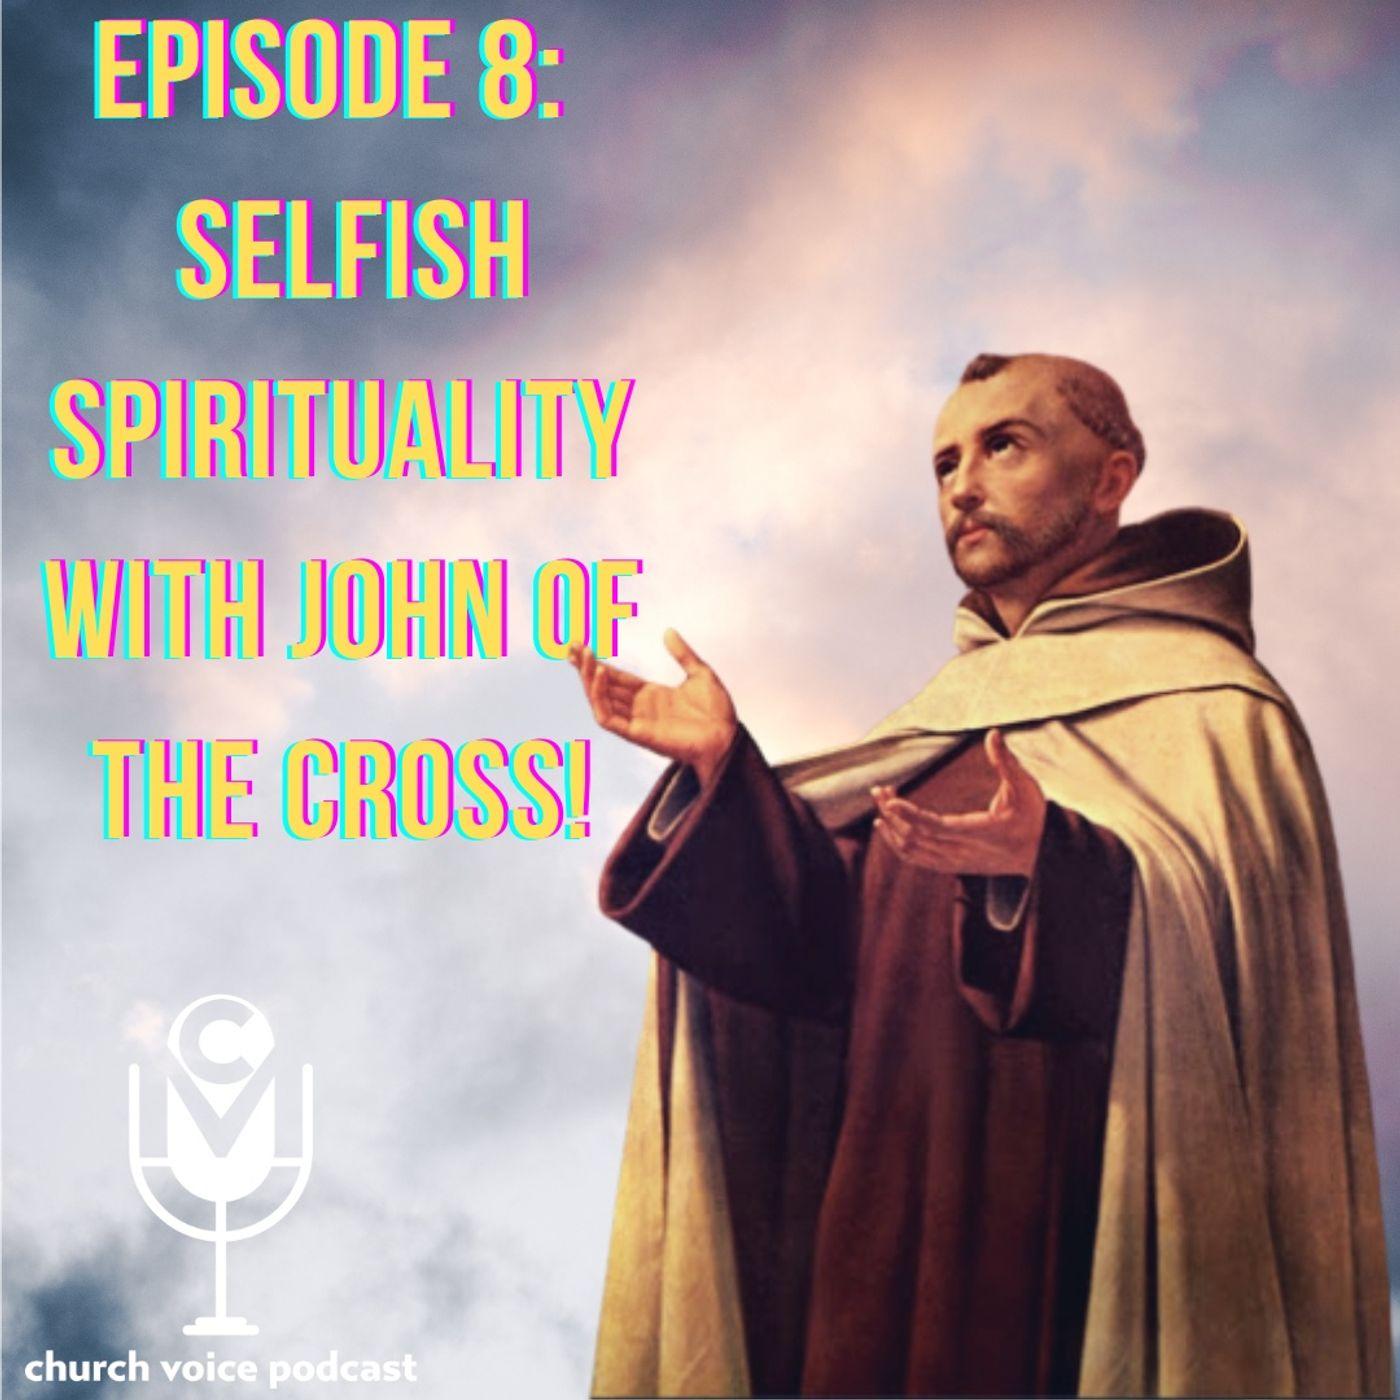 EP09 - Selfish Spirituality with John of The Cross!